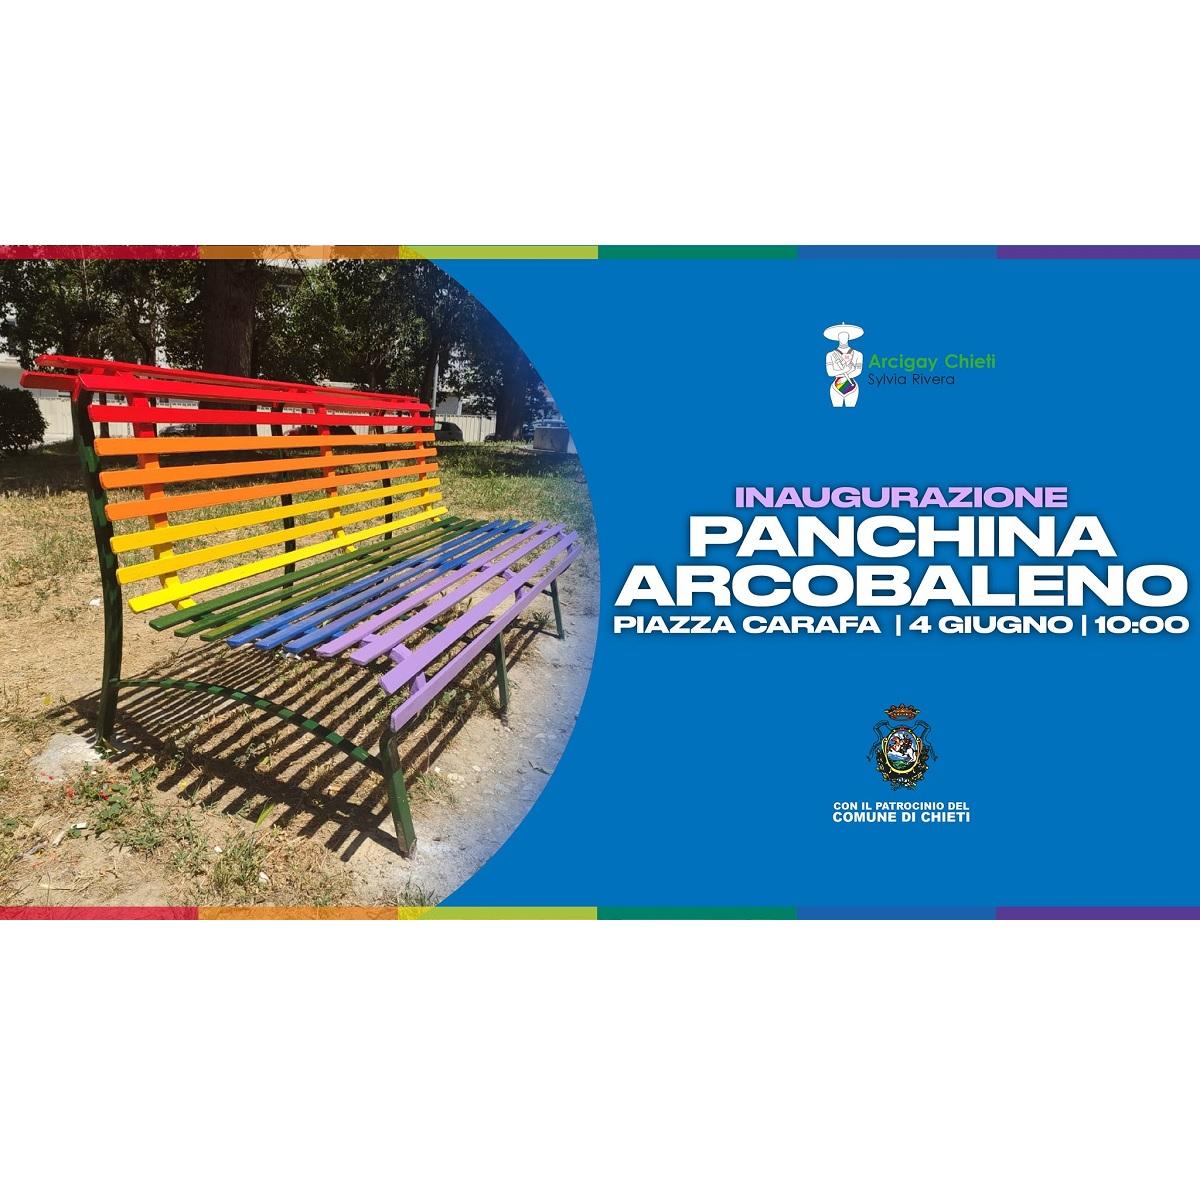 Inaugurazione Panchina Arcobaleno a Chieti Scalo locandina